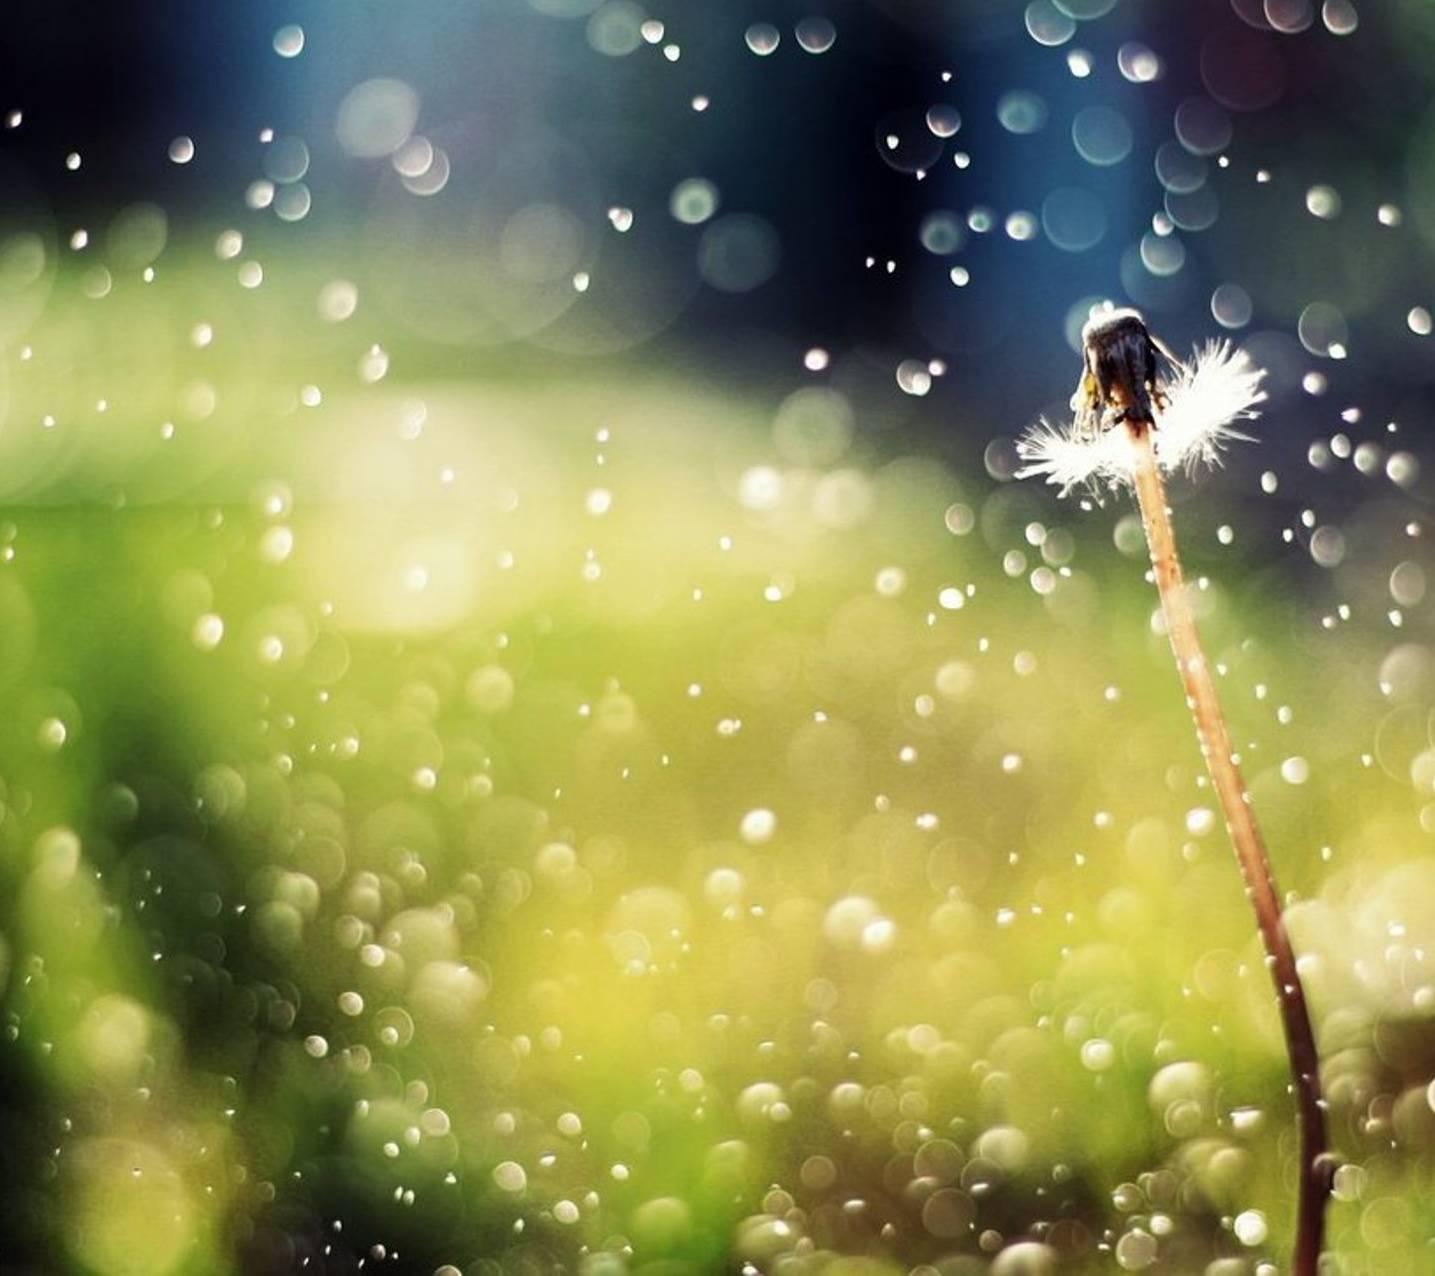 Rain Nature